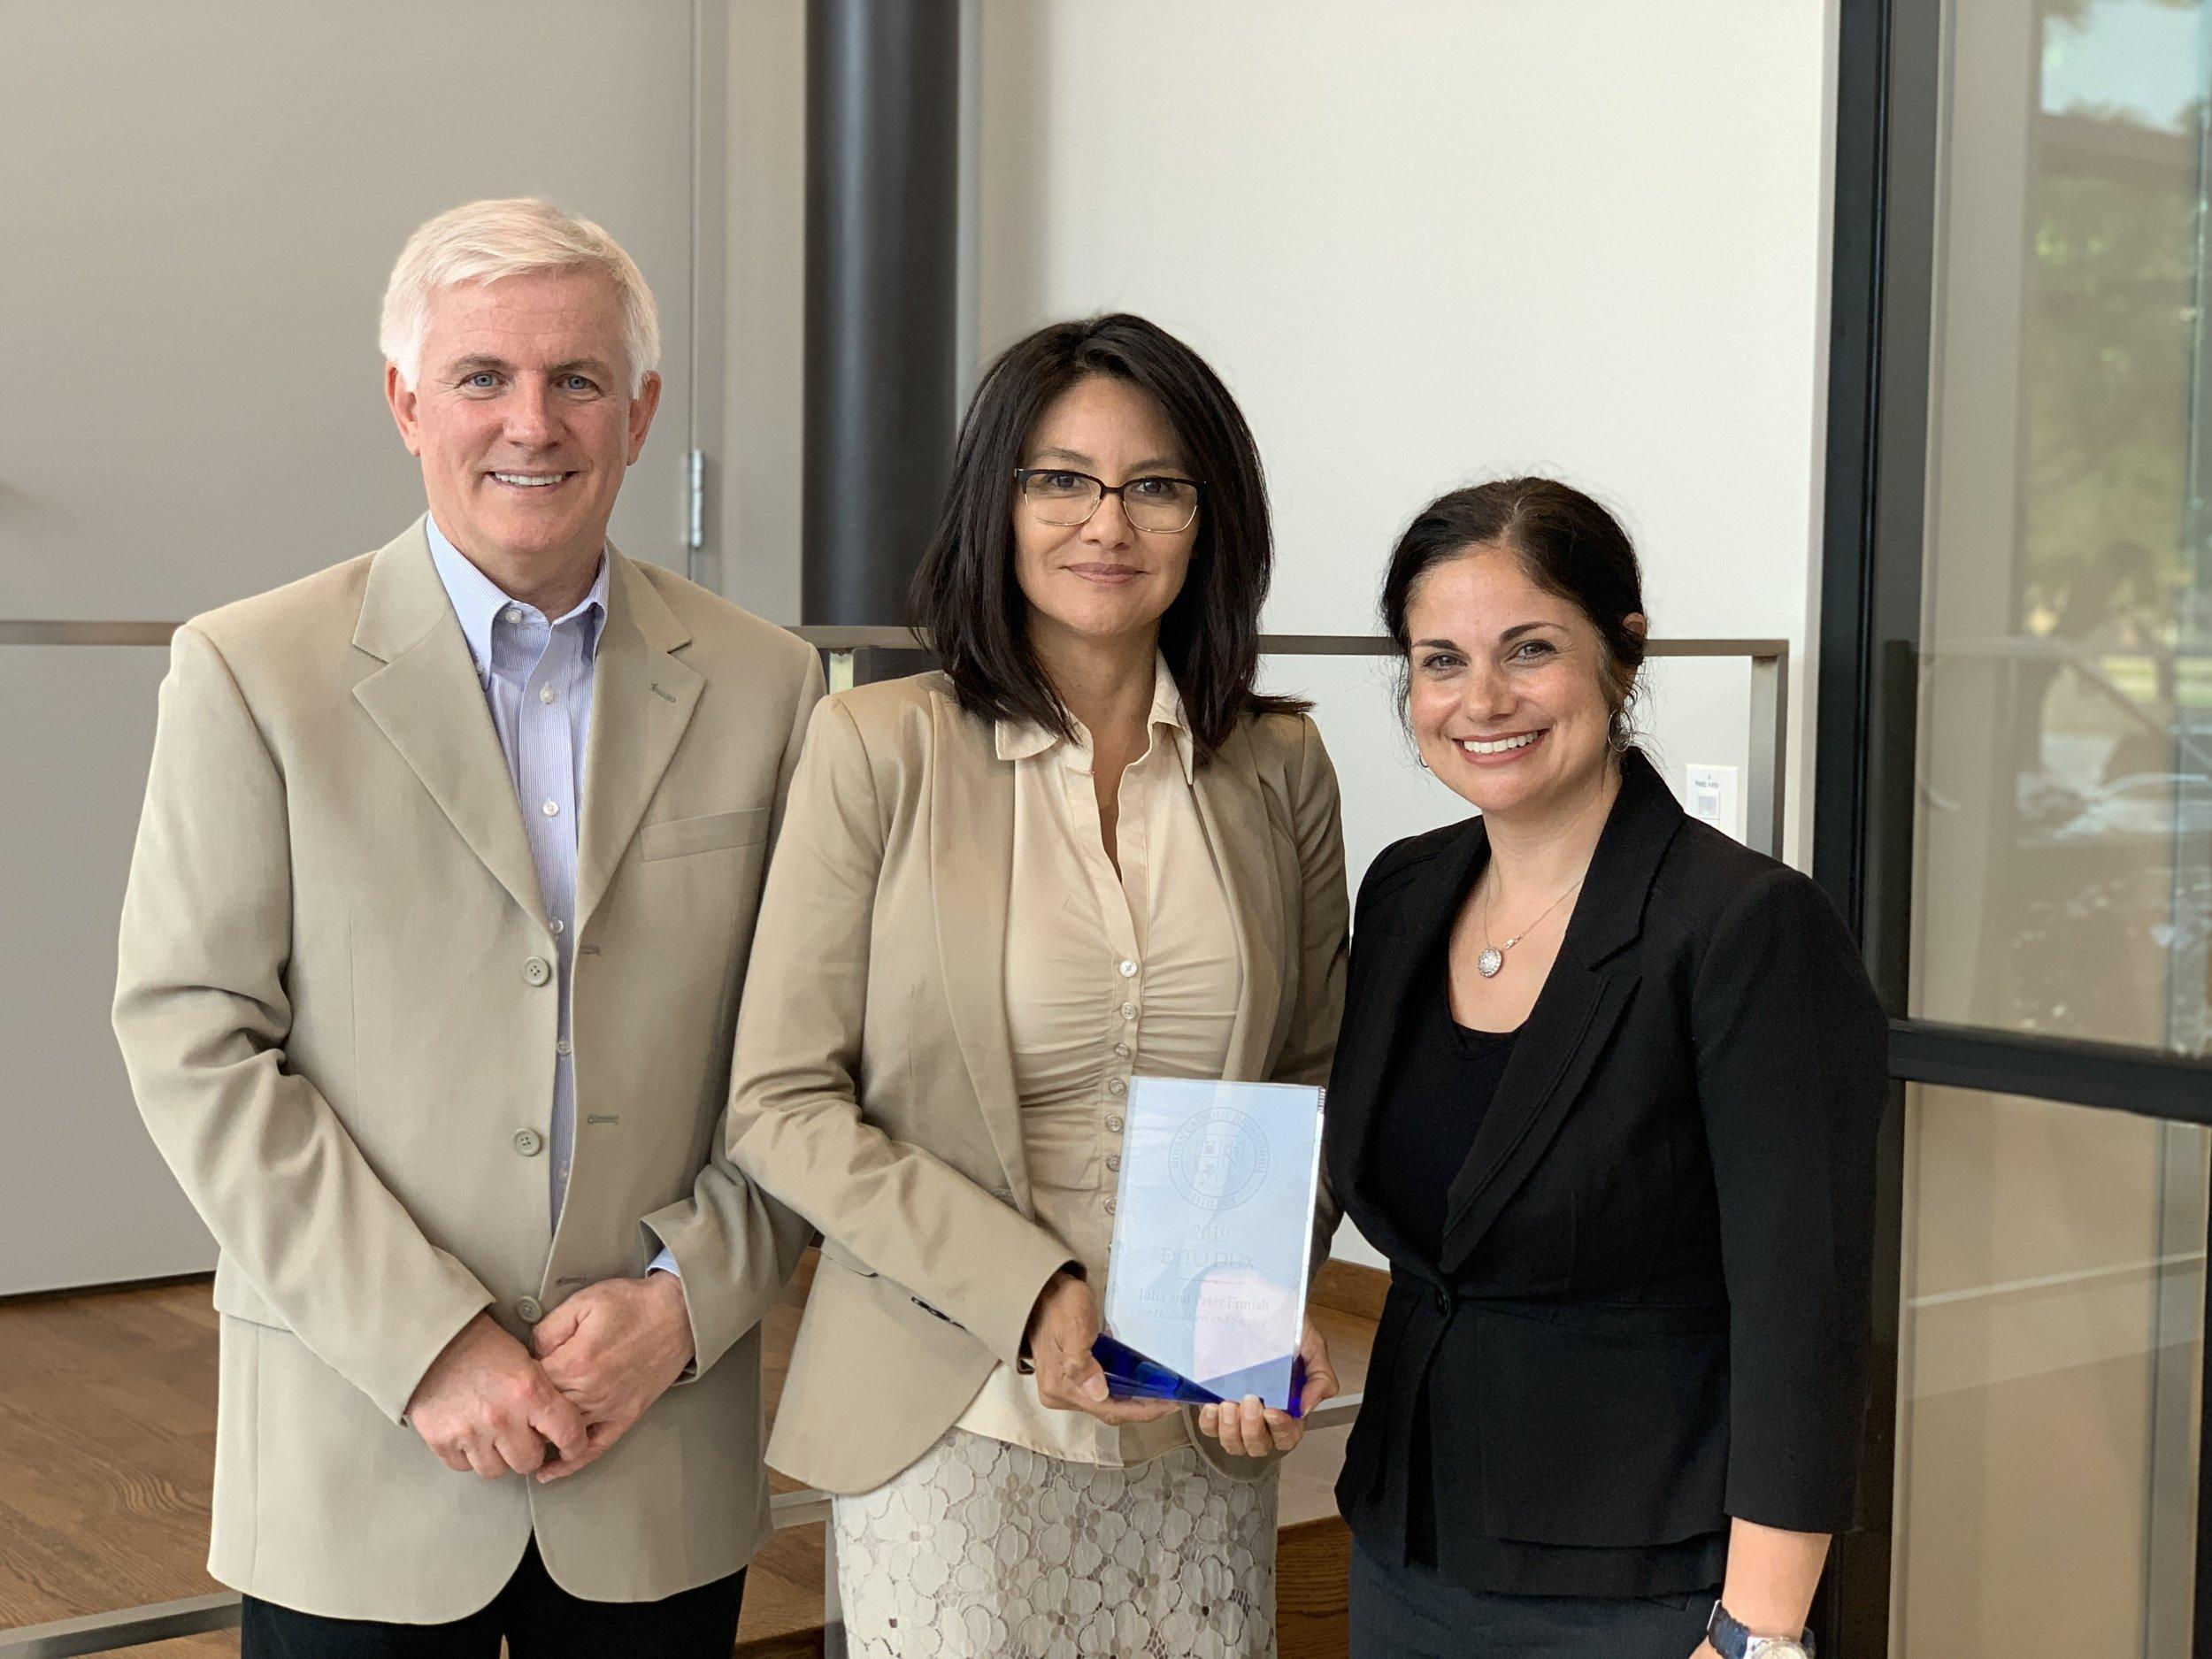 Pictured (left to right): Peter Ermish, Julia Ermish, President Leah Rios.